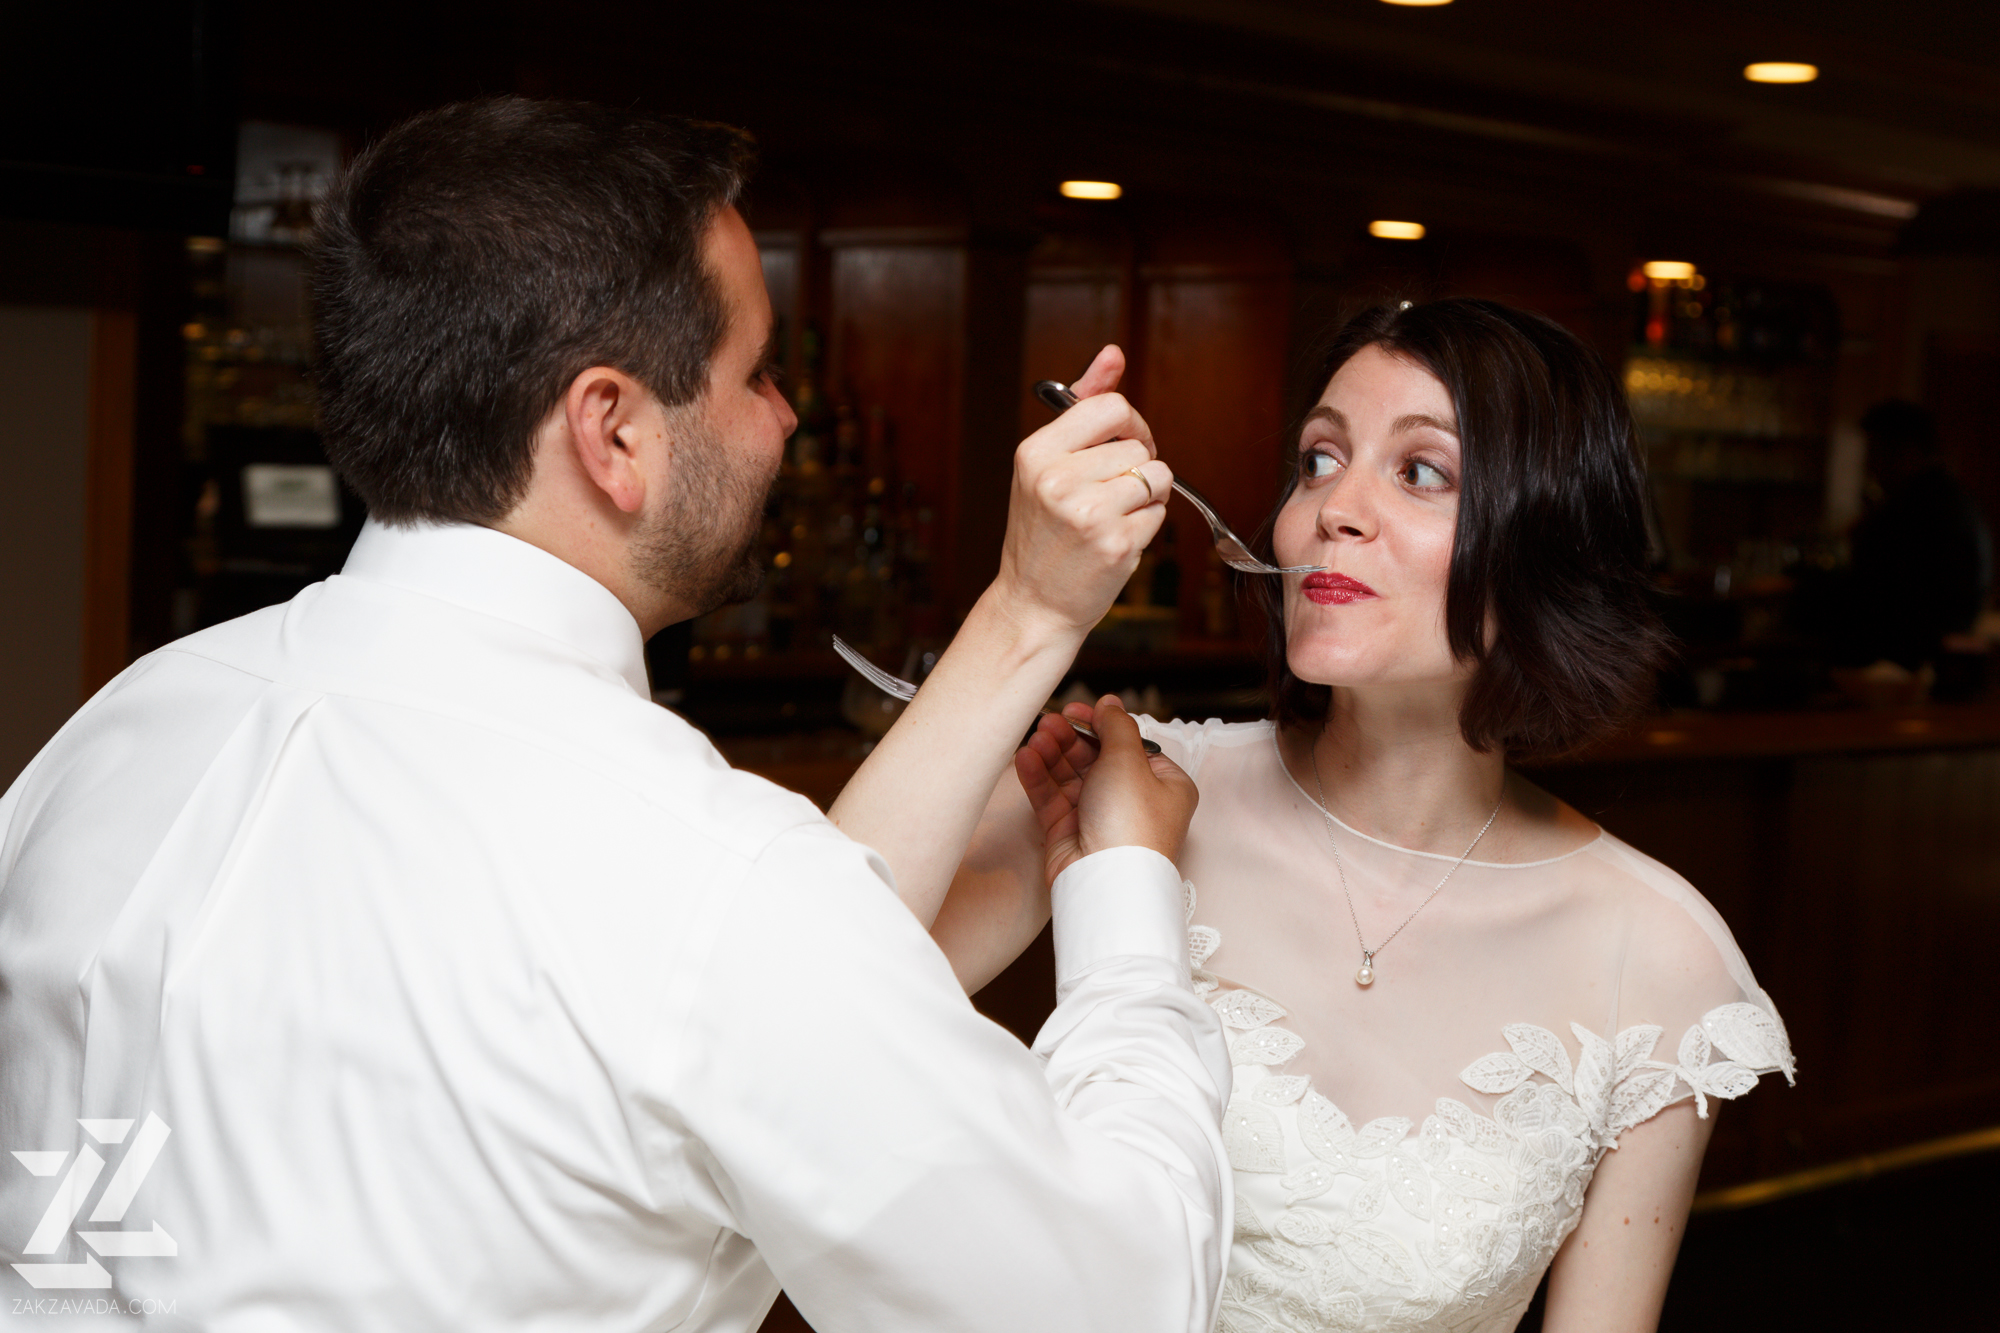 scranton-wedding-photography-zak-zavada-ruddyBelcastroWedding-798.jpg